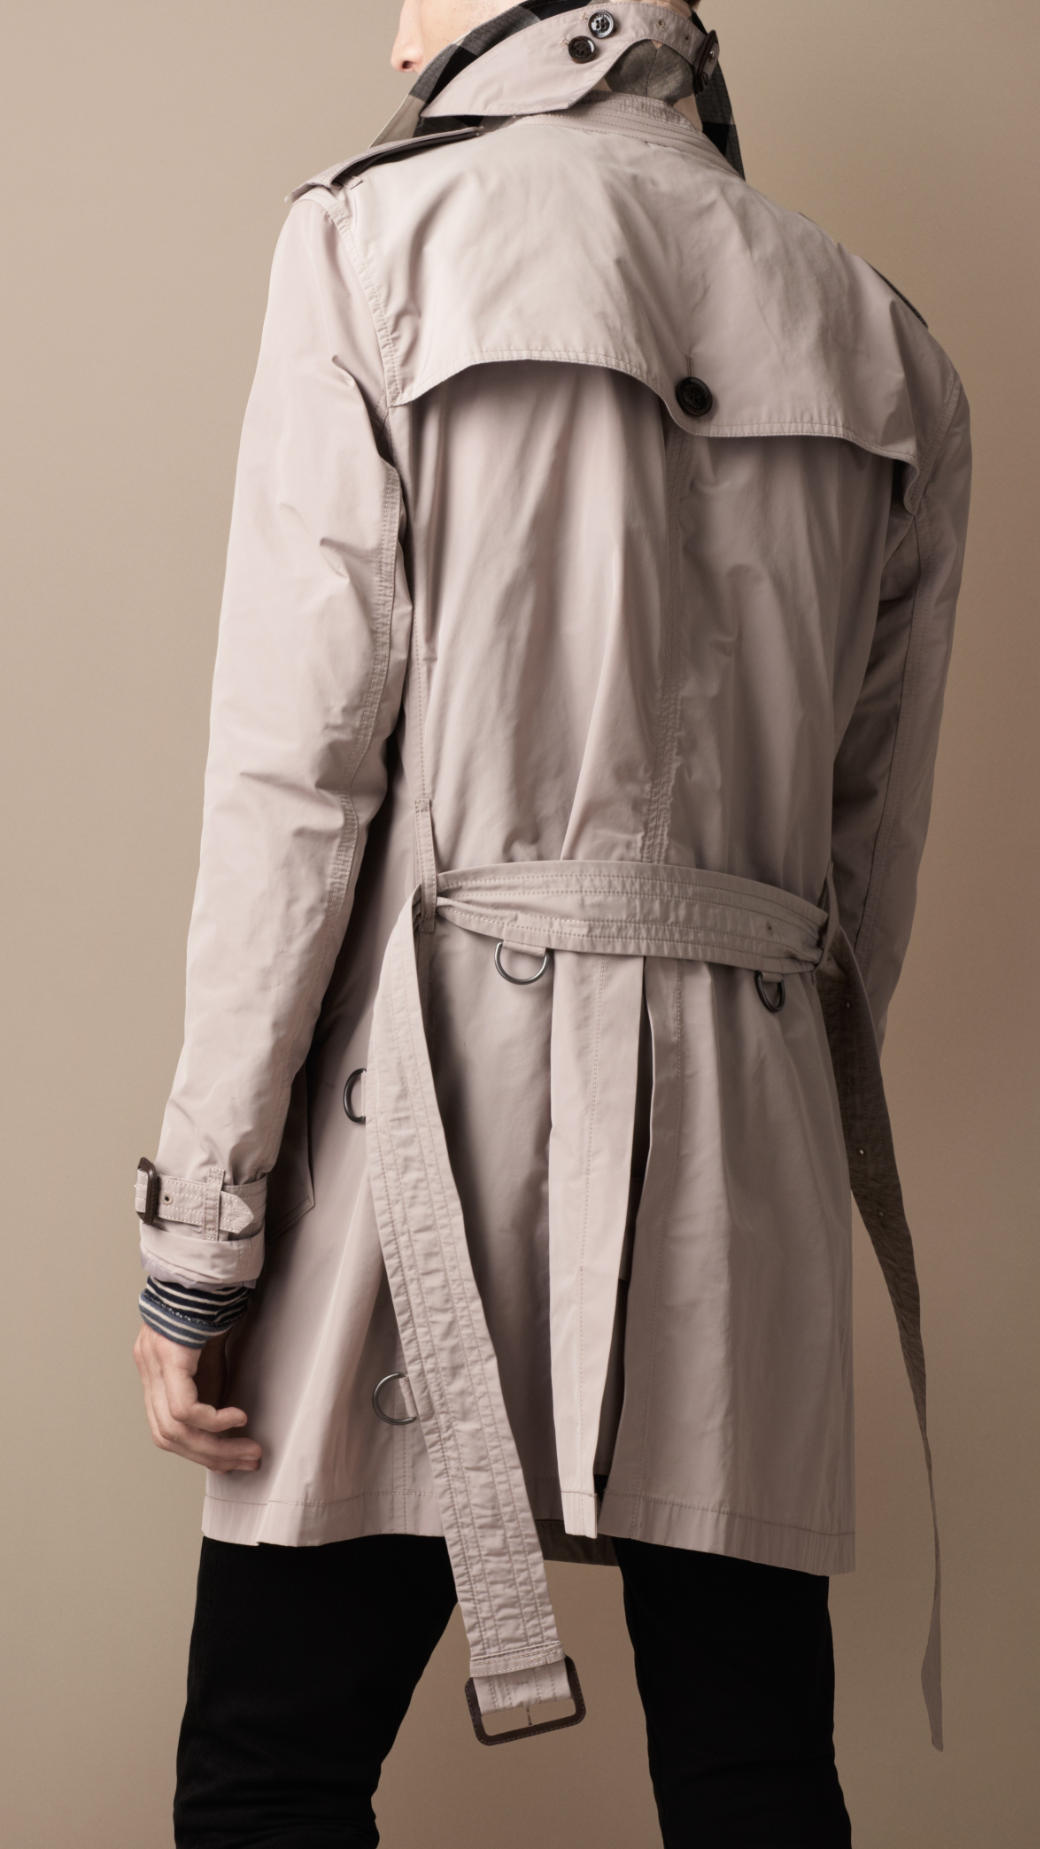 burberry brit packaway showerproof trench coat in brown. Black Bedroom Furniture Sets. Home Design Ideas